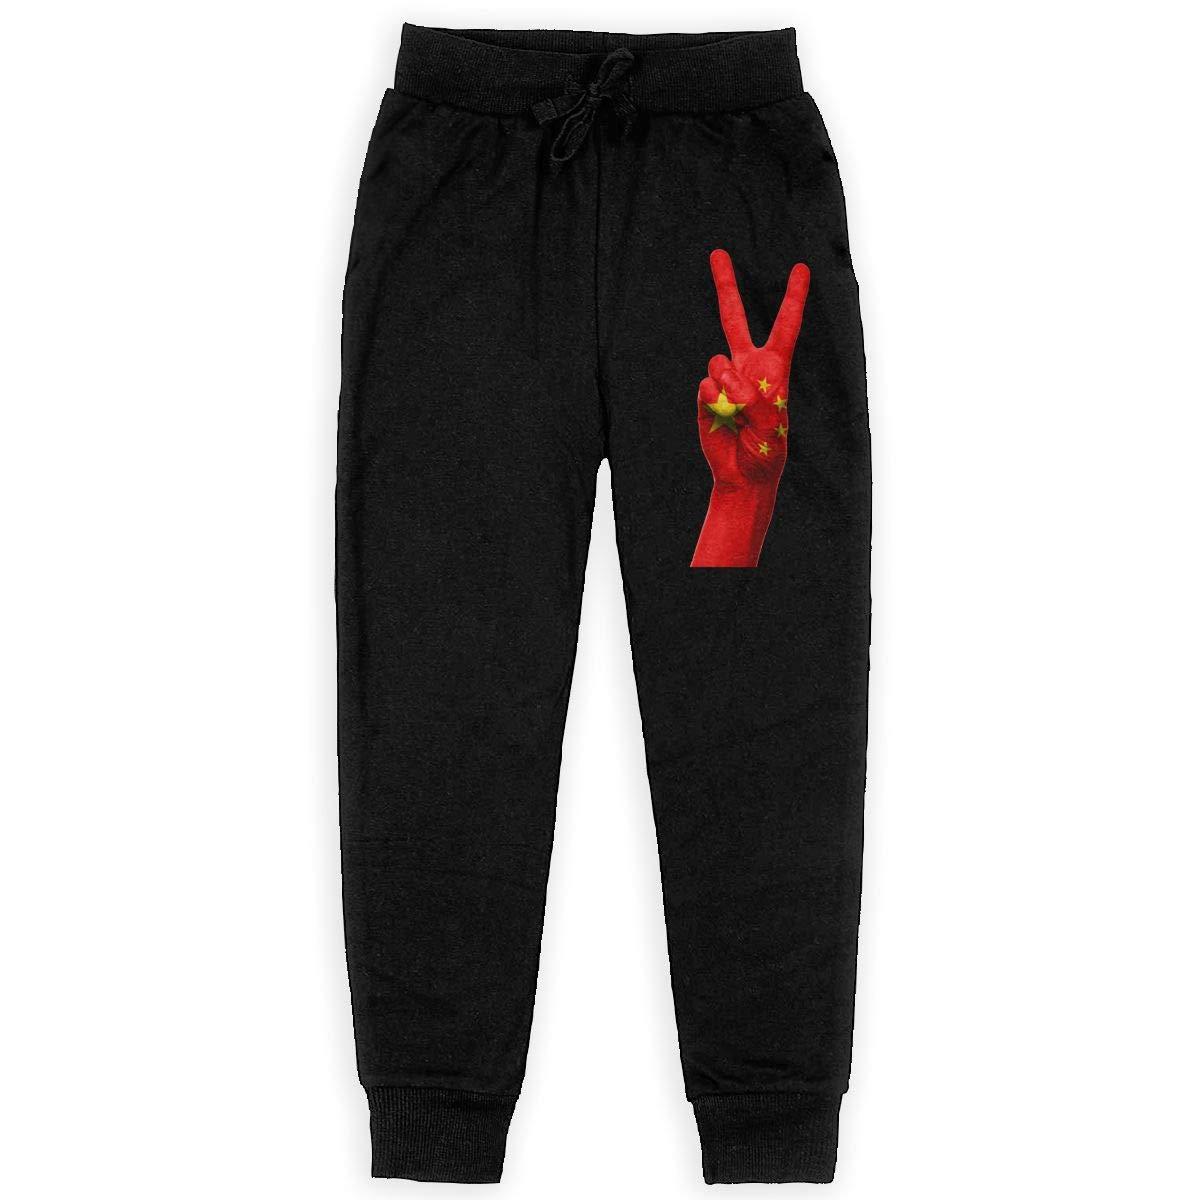 IufnNRJndfu China Boys Athletic Smart Fleece Pant Youth Soft and Cozy Sweatpants